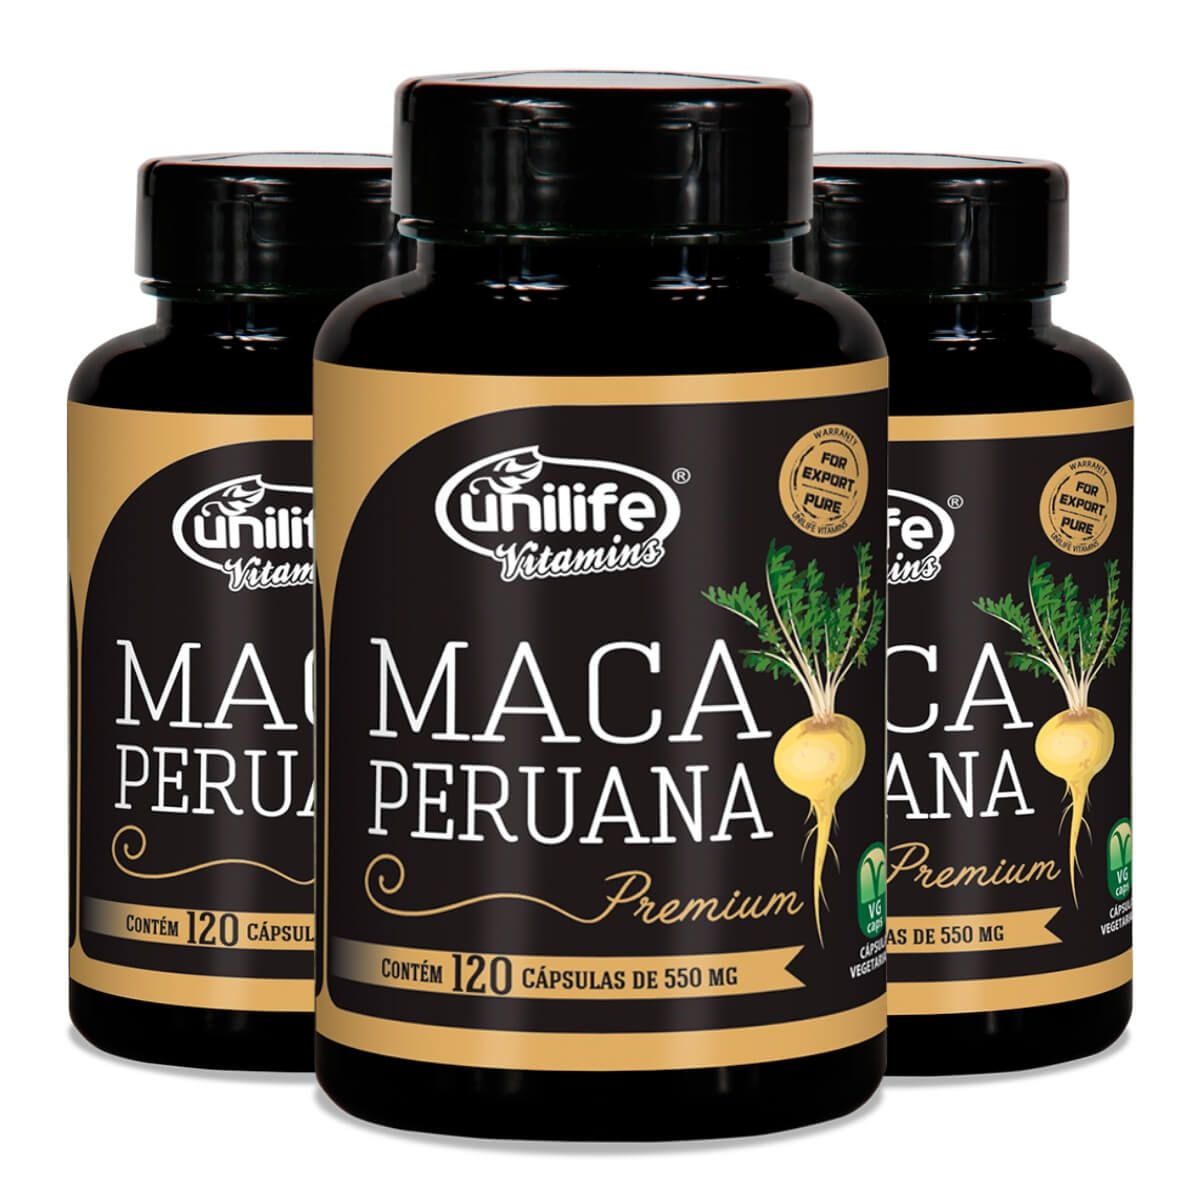 Kit 3 Maca Peruana Premium 100% Pura 550mg - 120 Cápsulas Original - Natueu